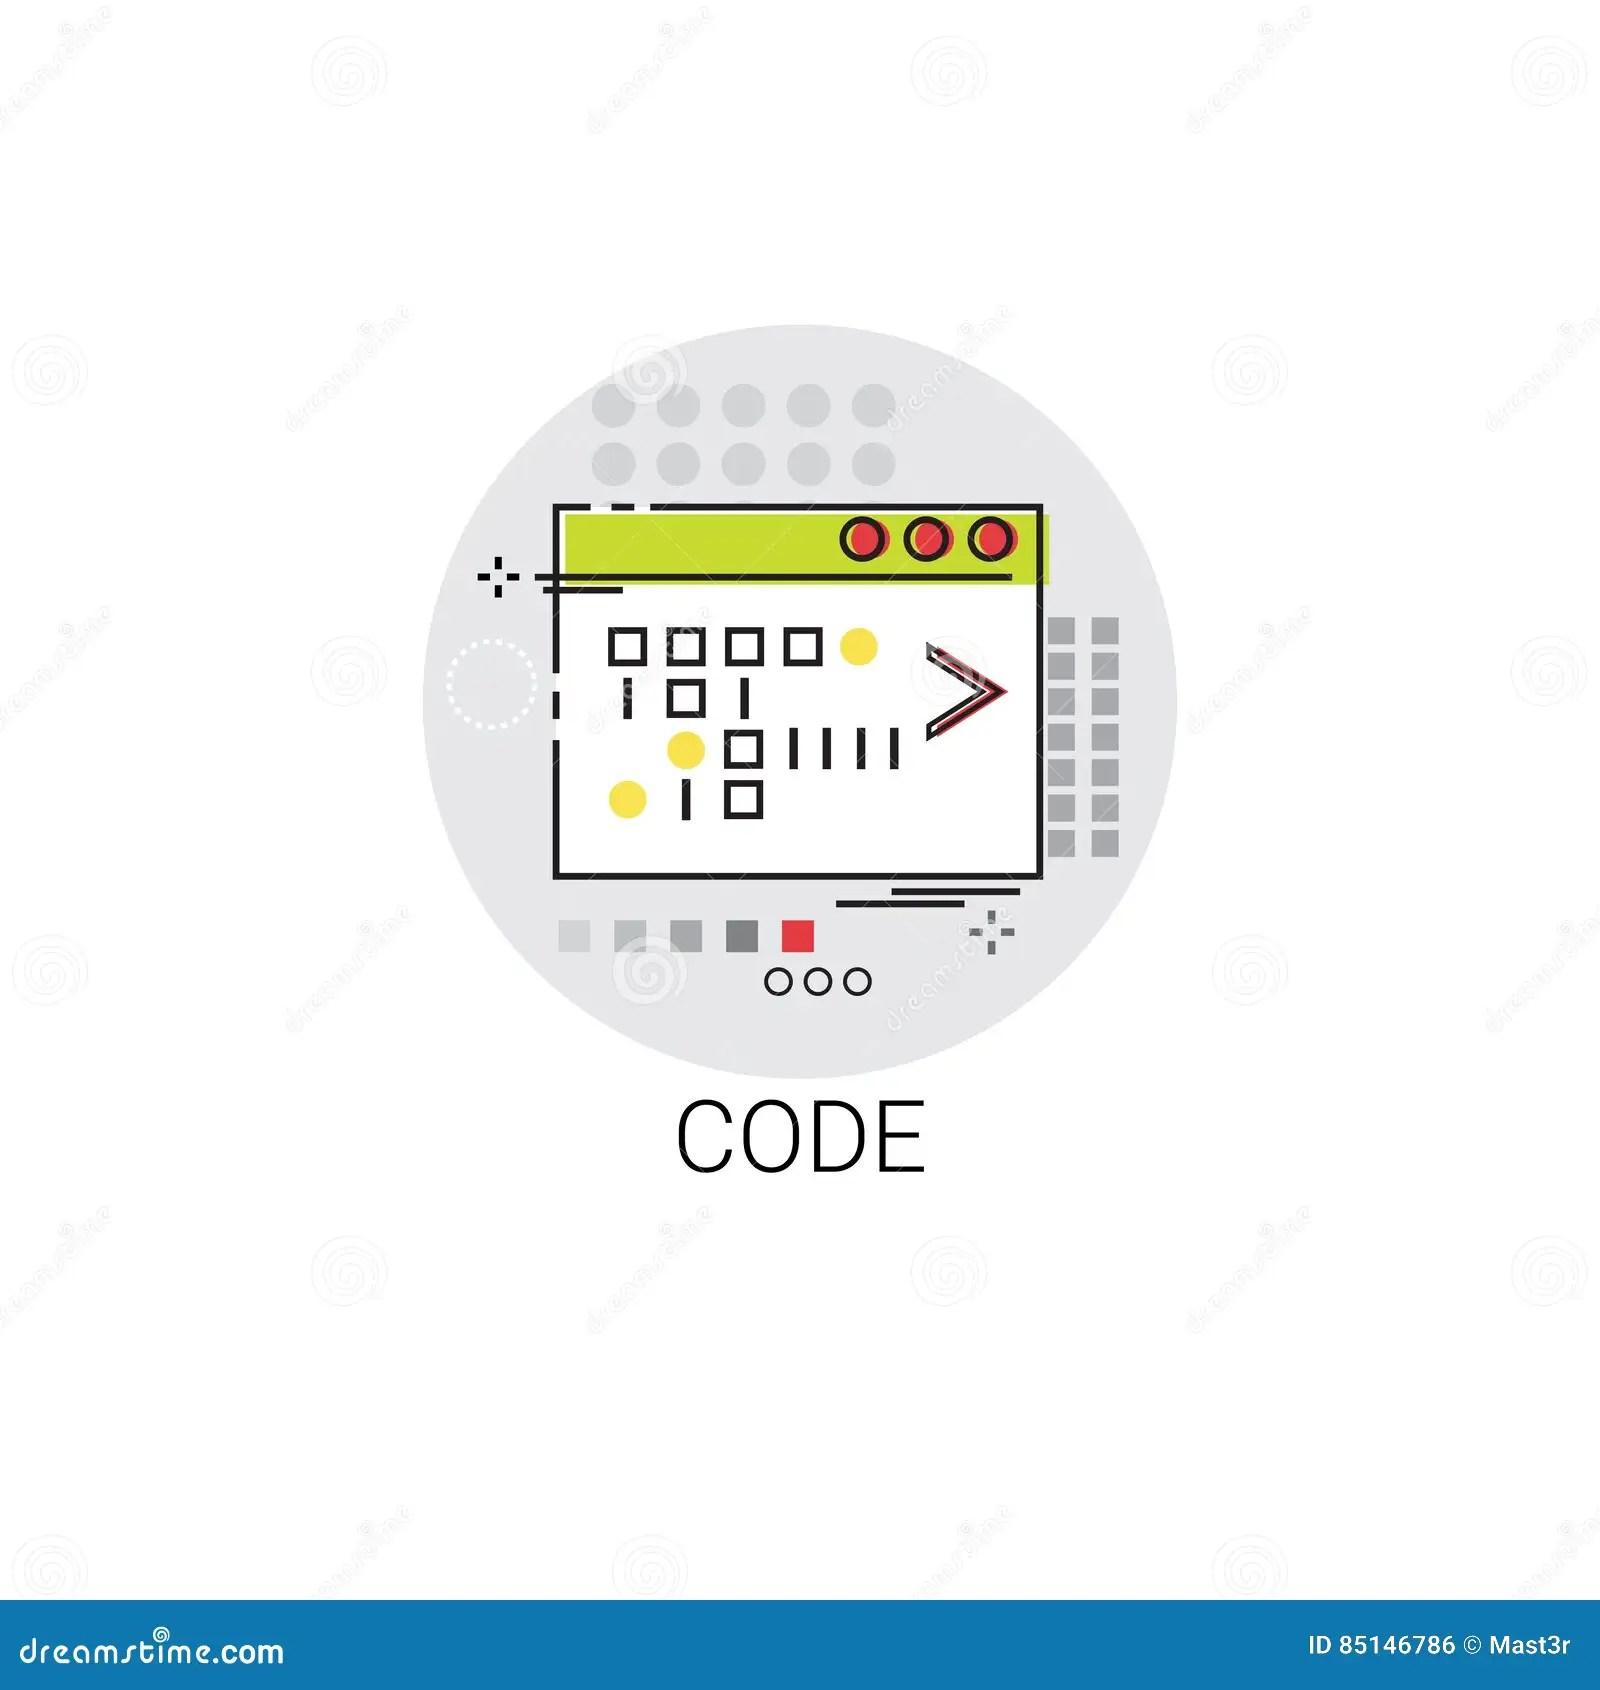 Entrepreneur Cell Shop Code Development